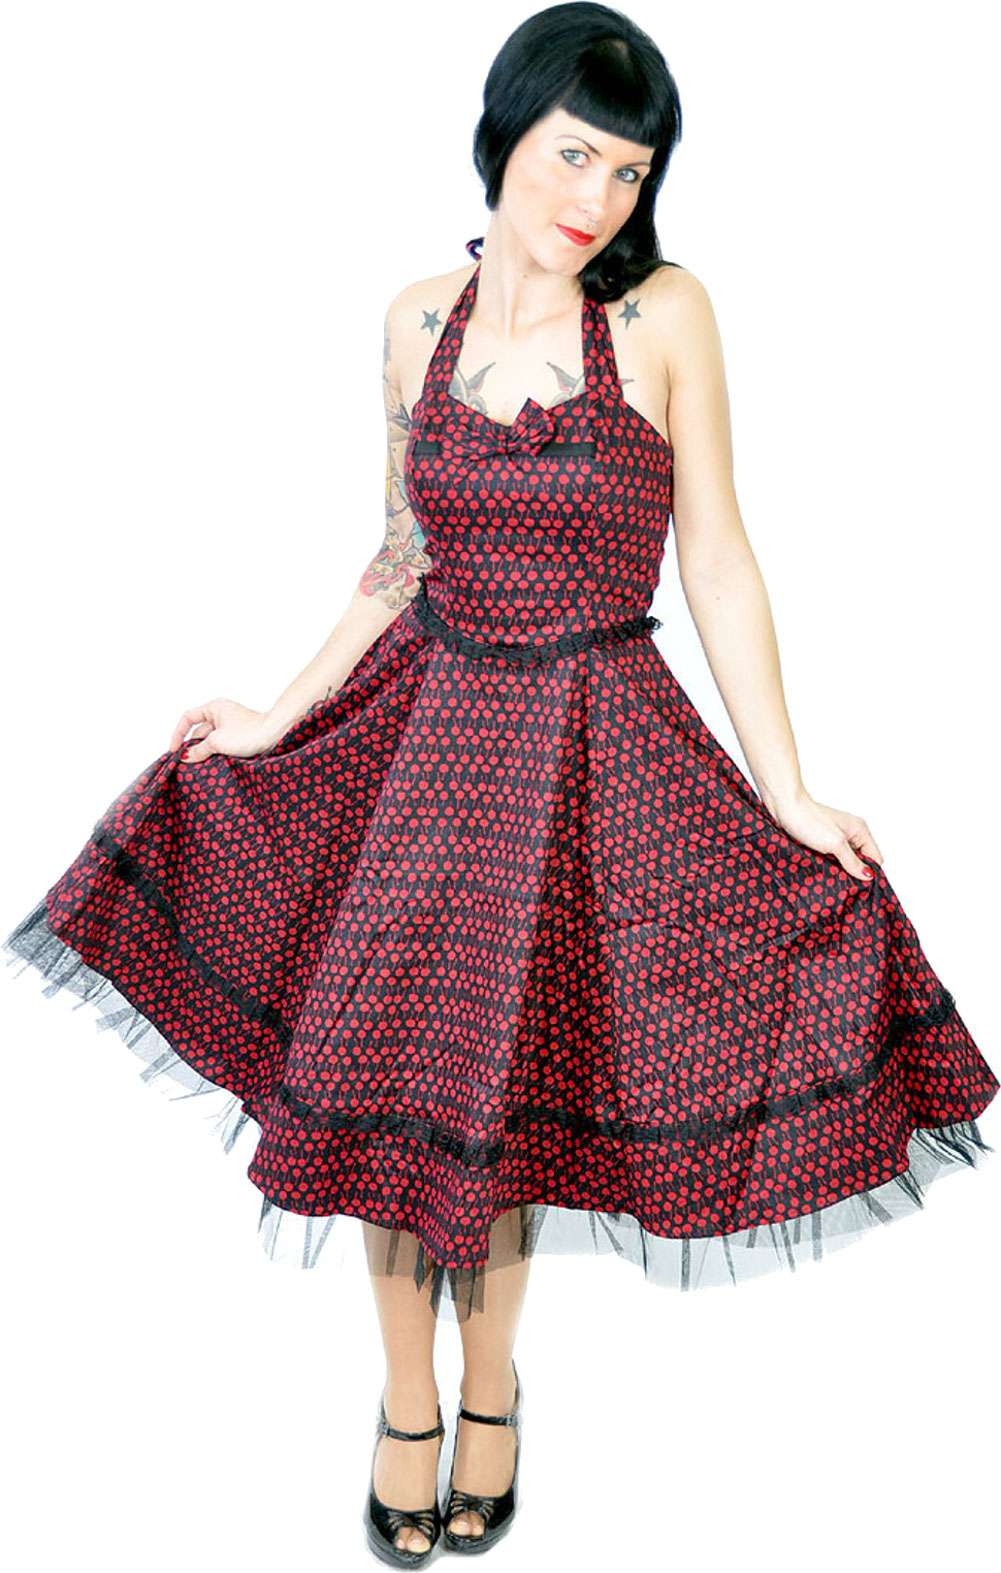 Hearts Roses Cherries Kirschen Petticoat 50s Kleid Schwarz5a1ff0efc3858 1280x1280 2x